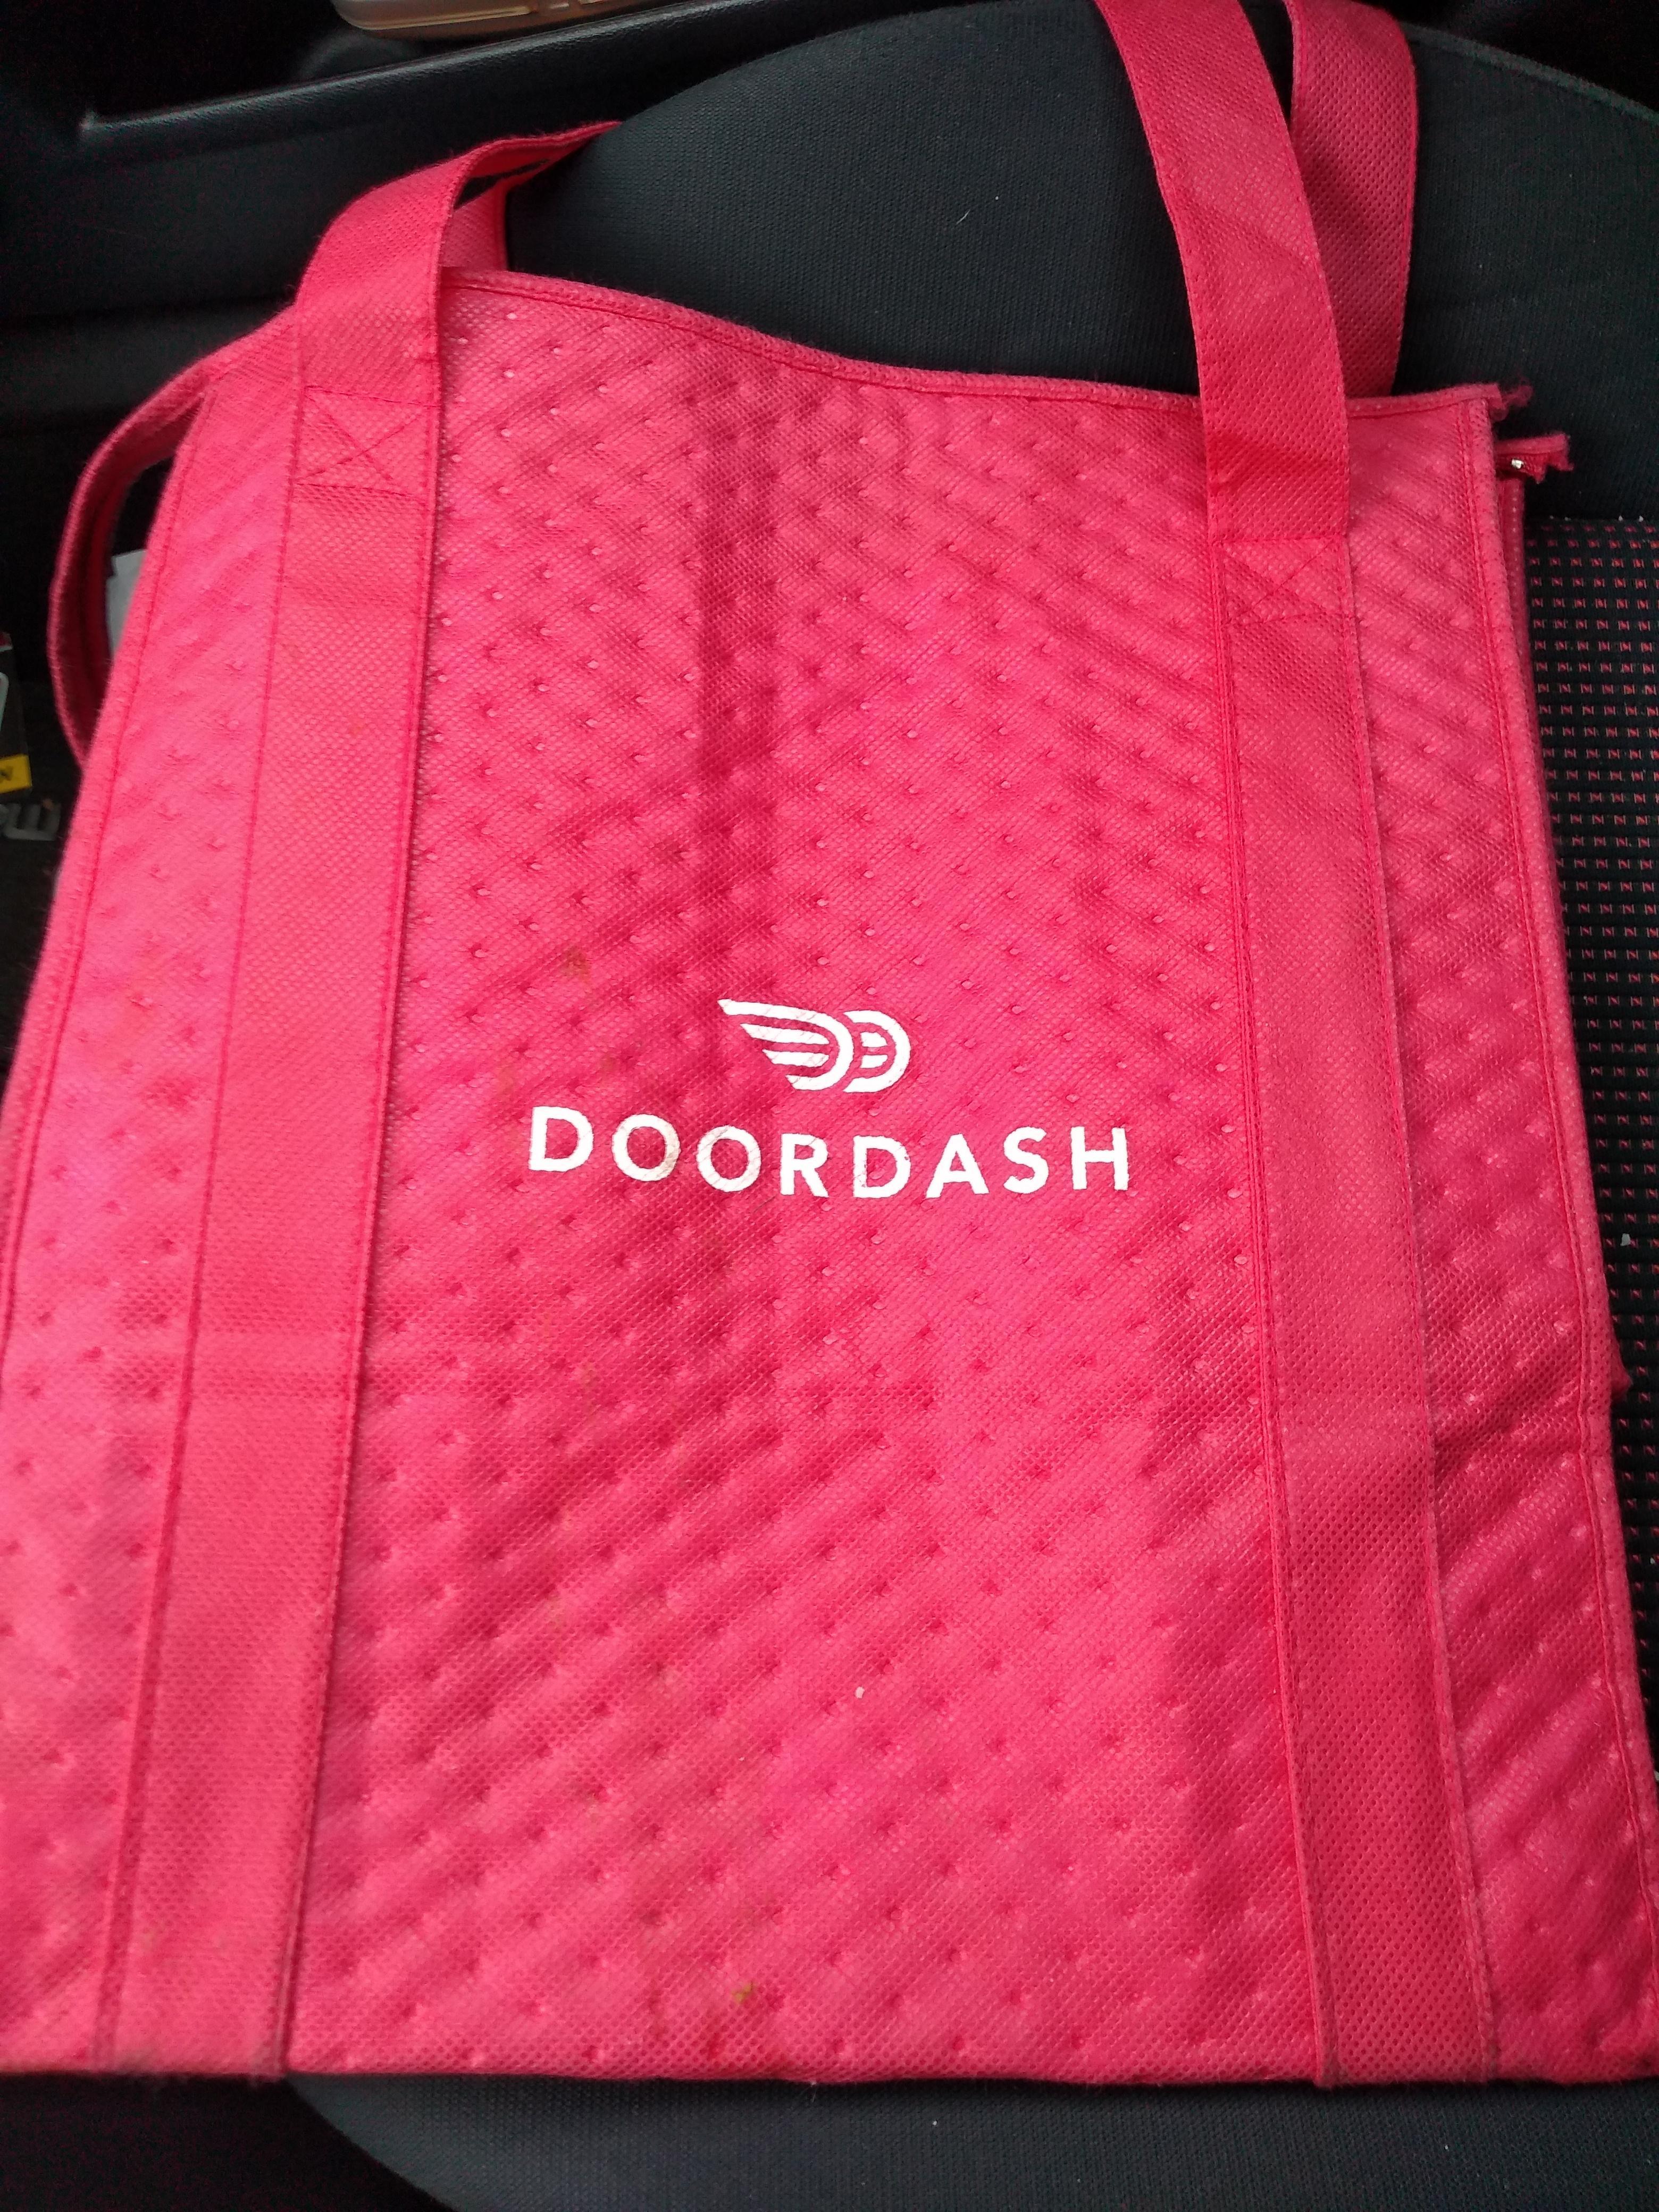 Doordash Insulated Bag : doordash, insulated, Doordash, Inspiration